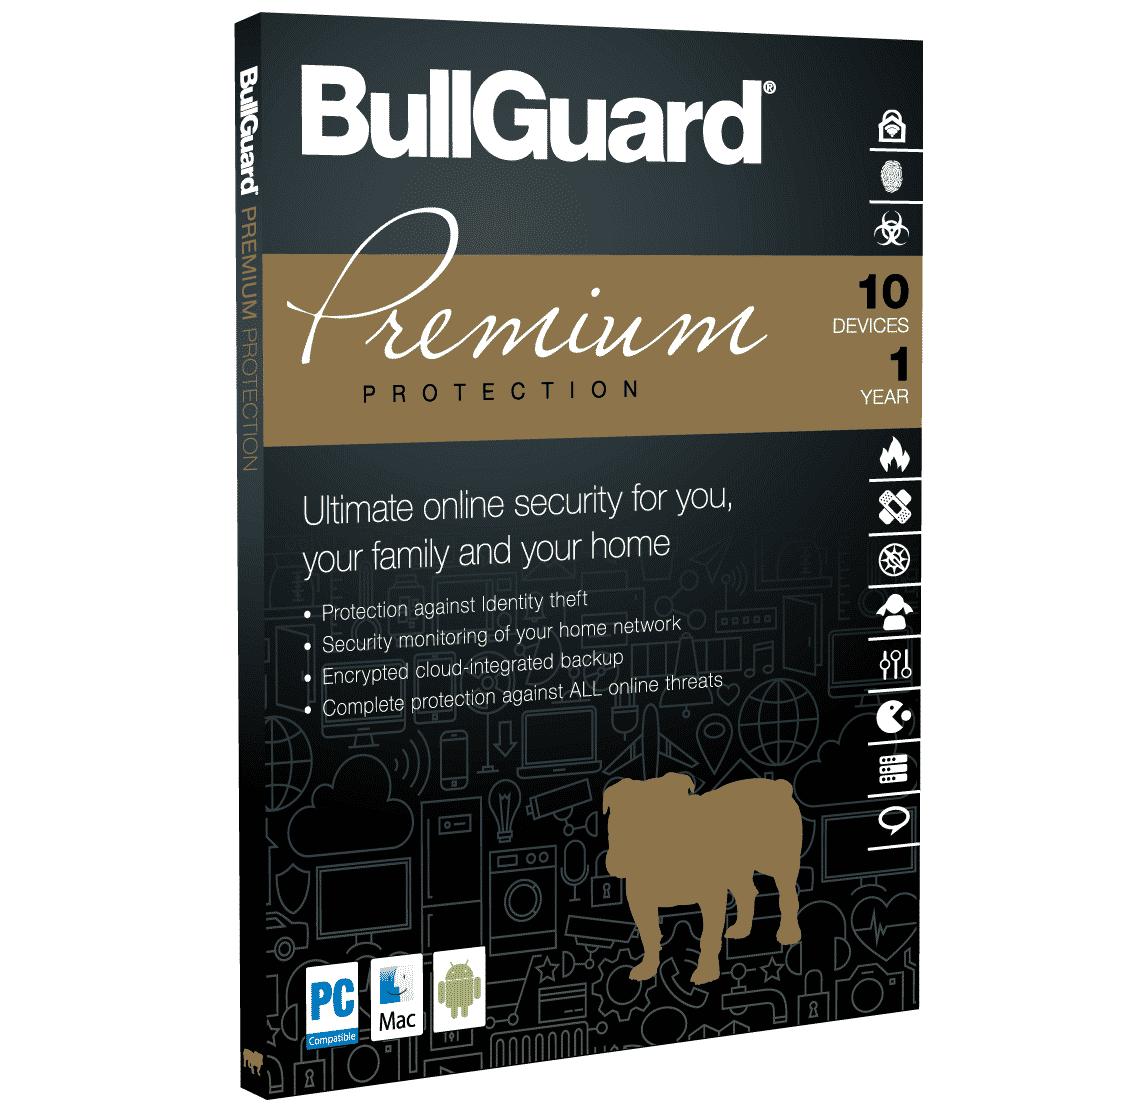 product bullguard premium protection antivirus software 10 apparaten